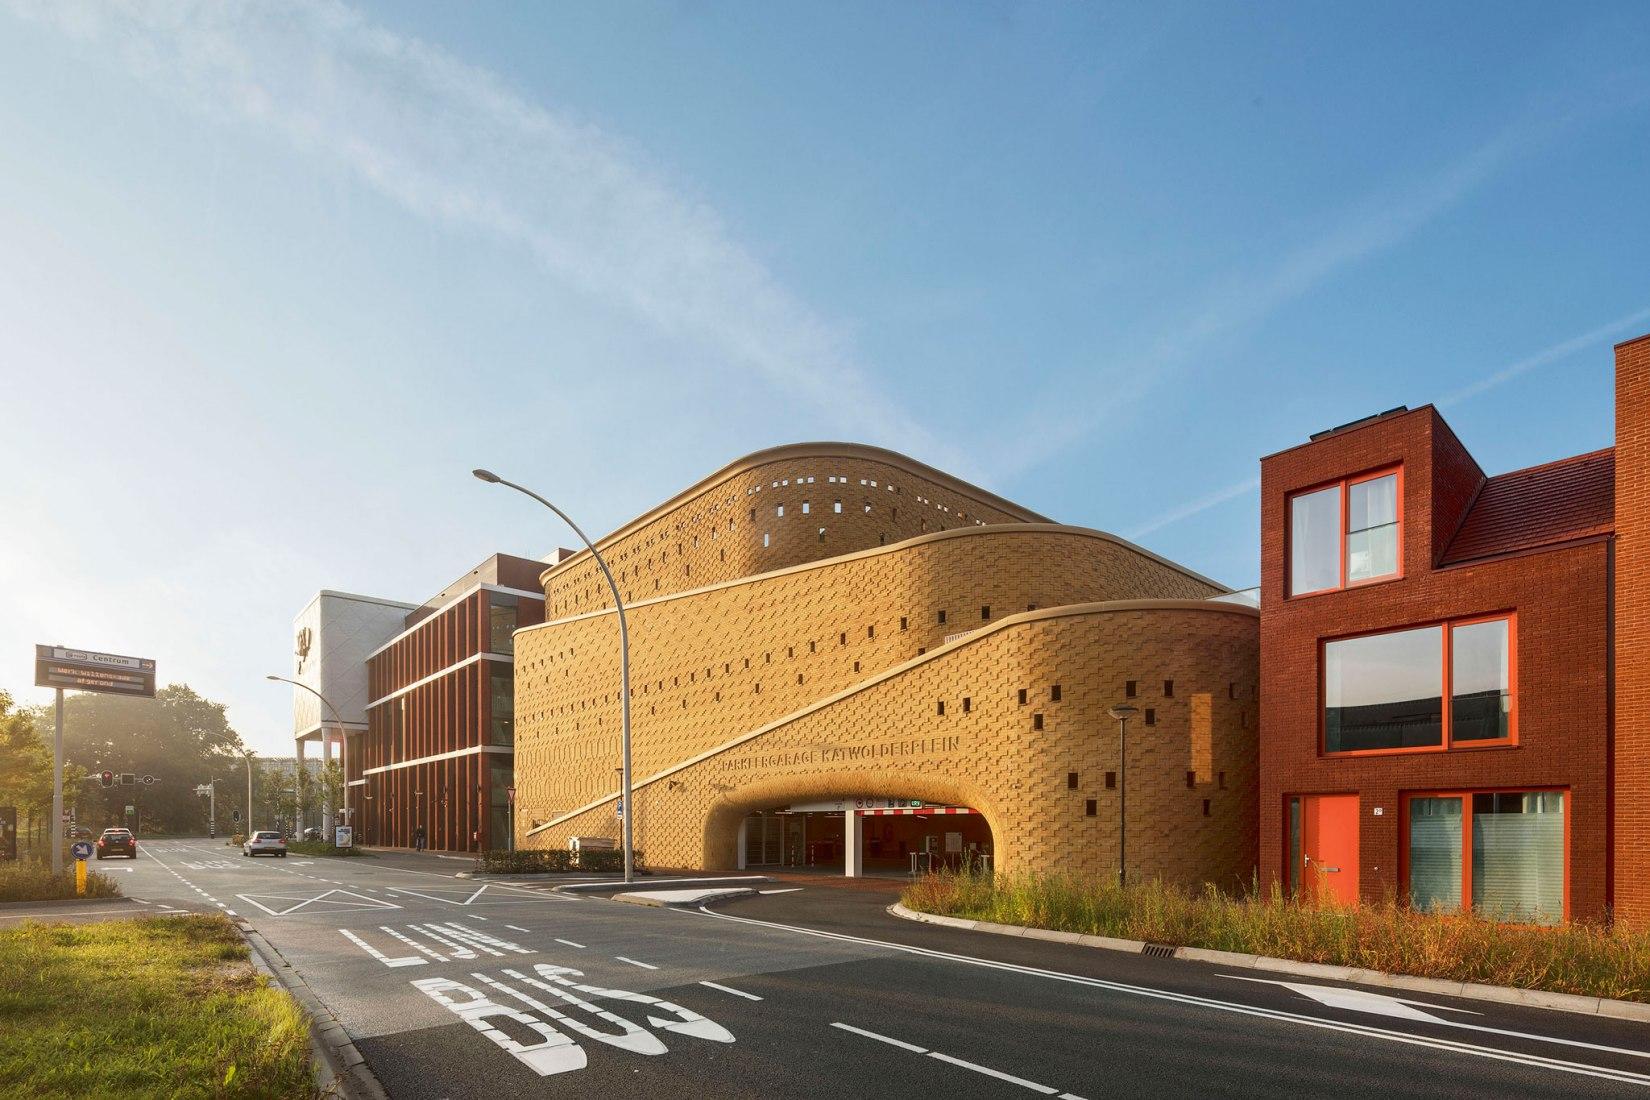 Vista exterior. Aparcamiento Katwolderplein por Dok architecten. Fotografía por Arjen Schmitz